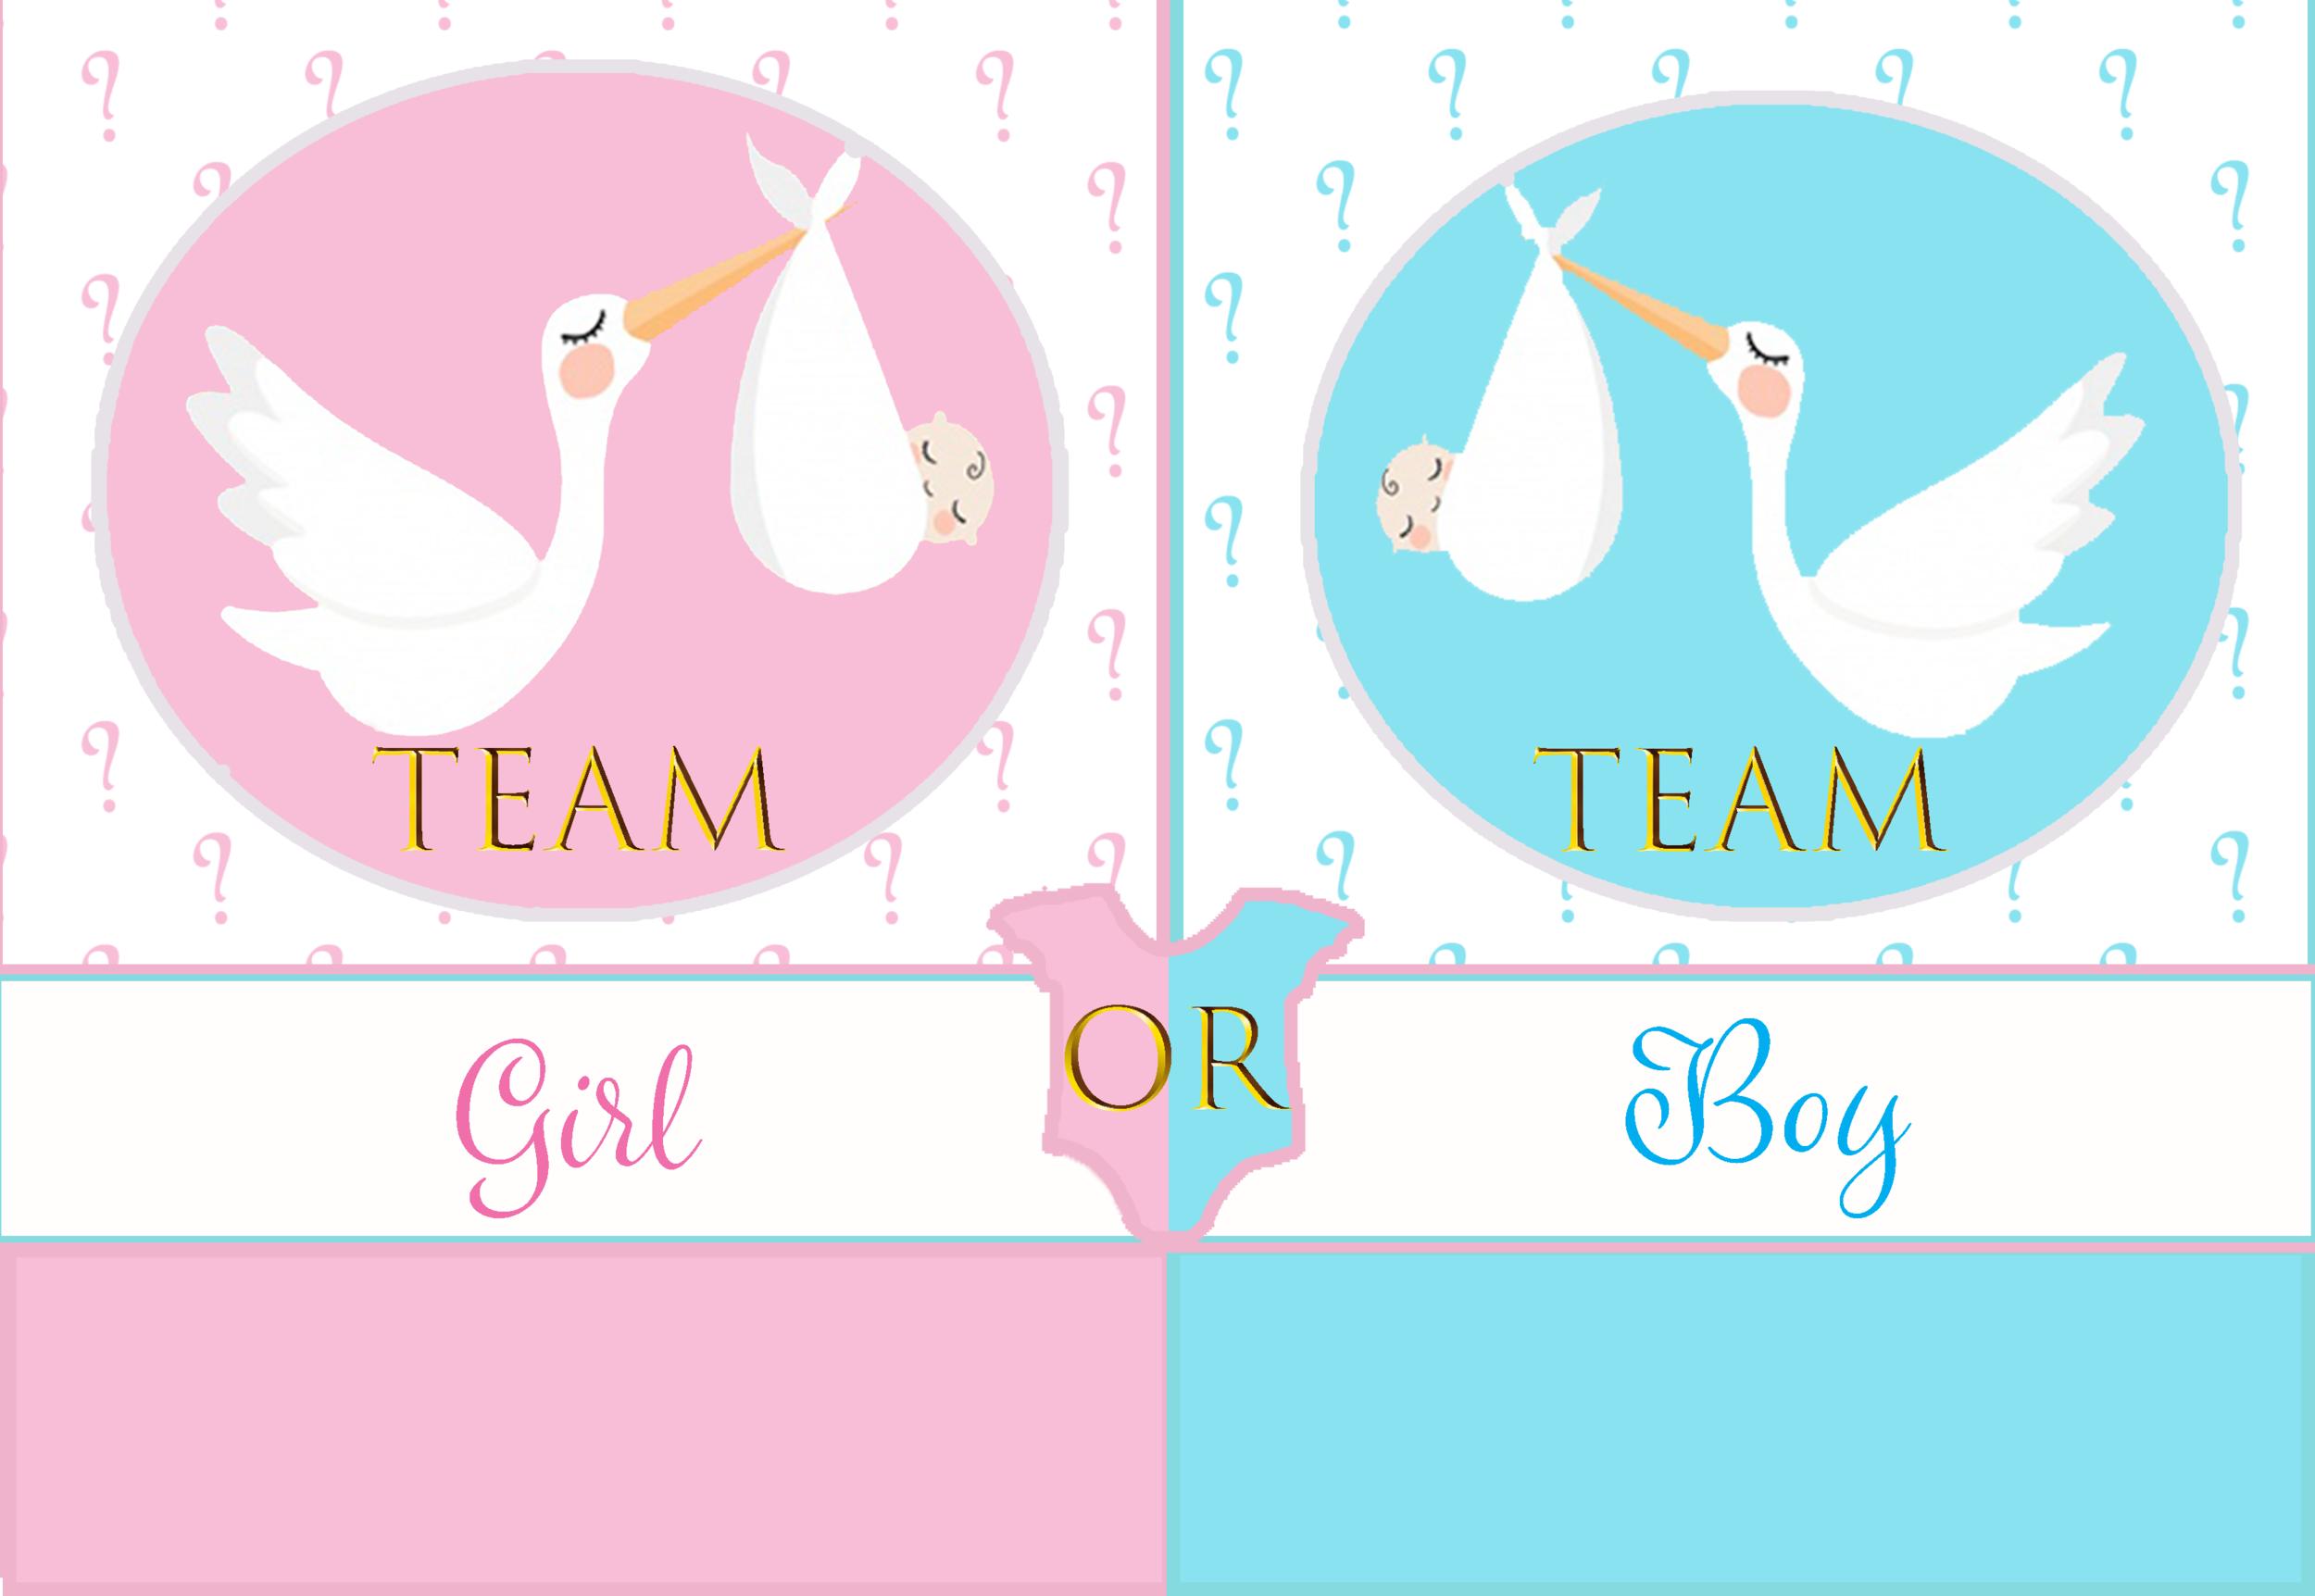 planche inspiration team girl or team boy